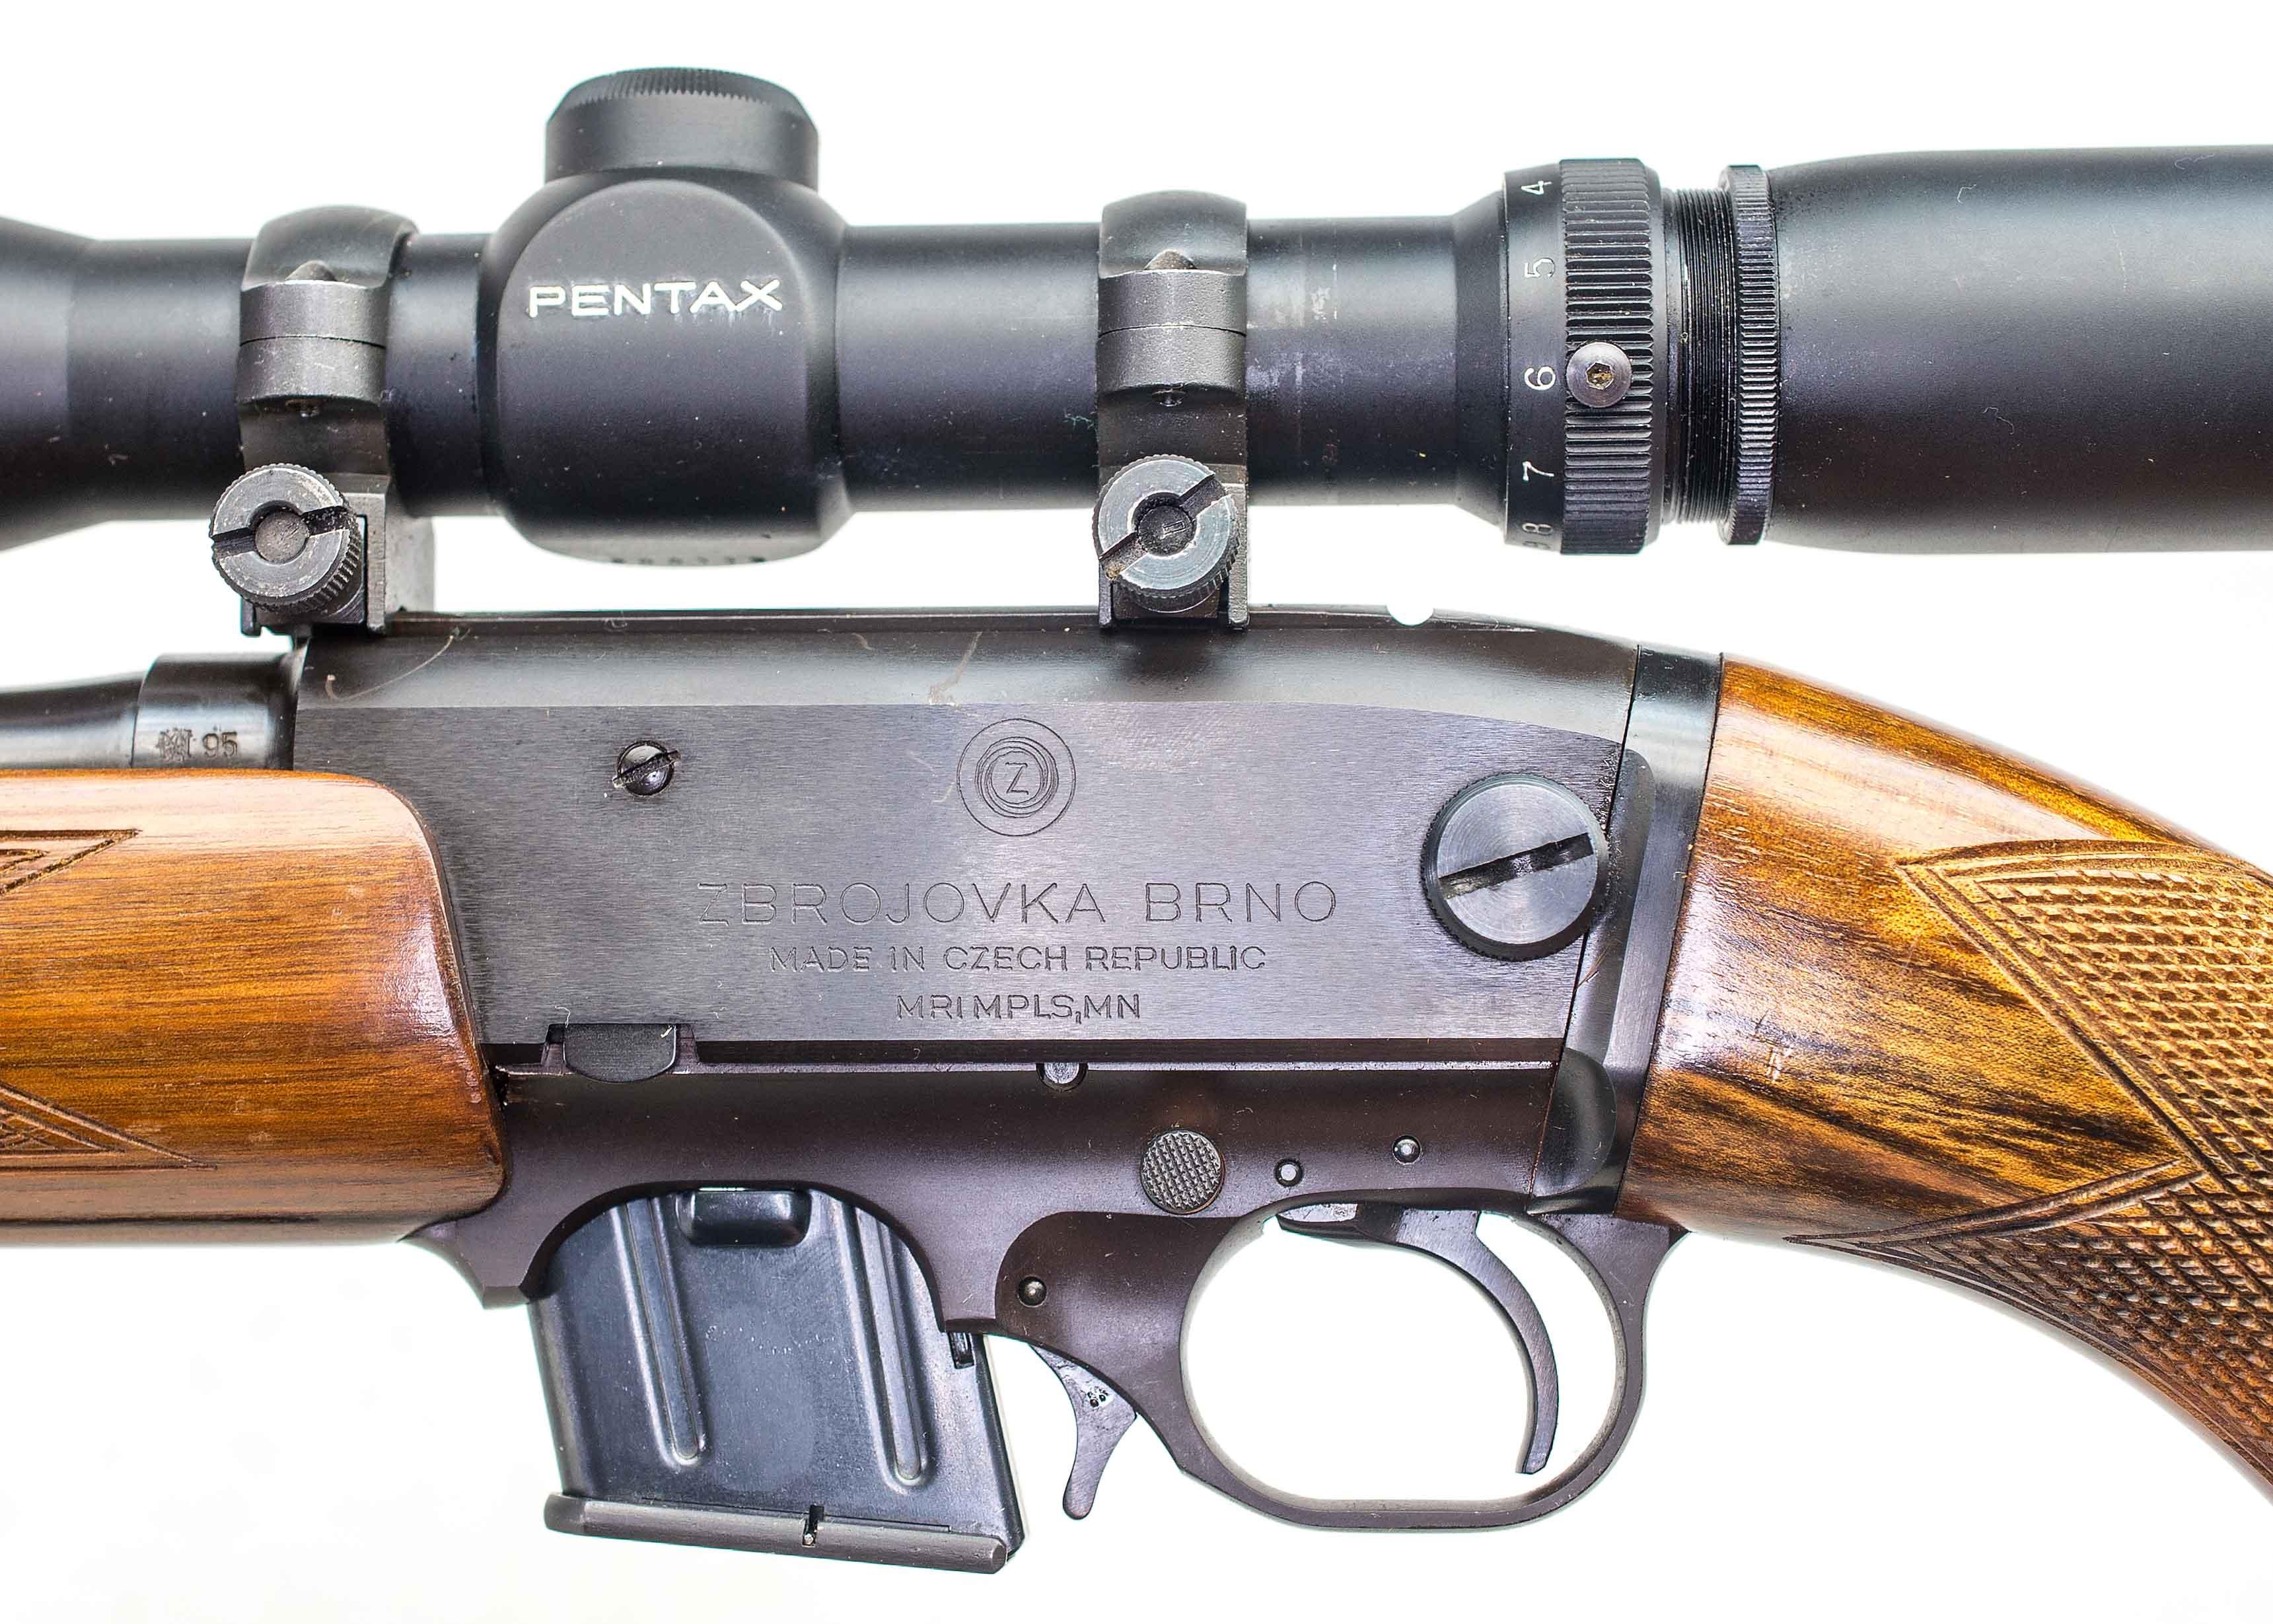 CZ BRNO MODEL ZKM-611 (Auction ID: 10021835, End Time : Dec